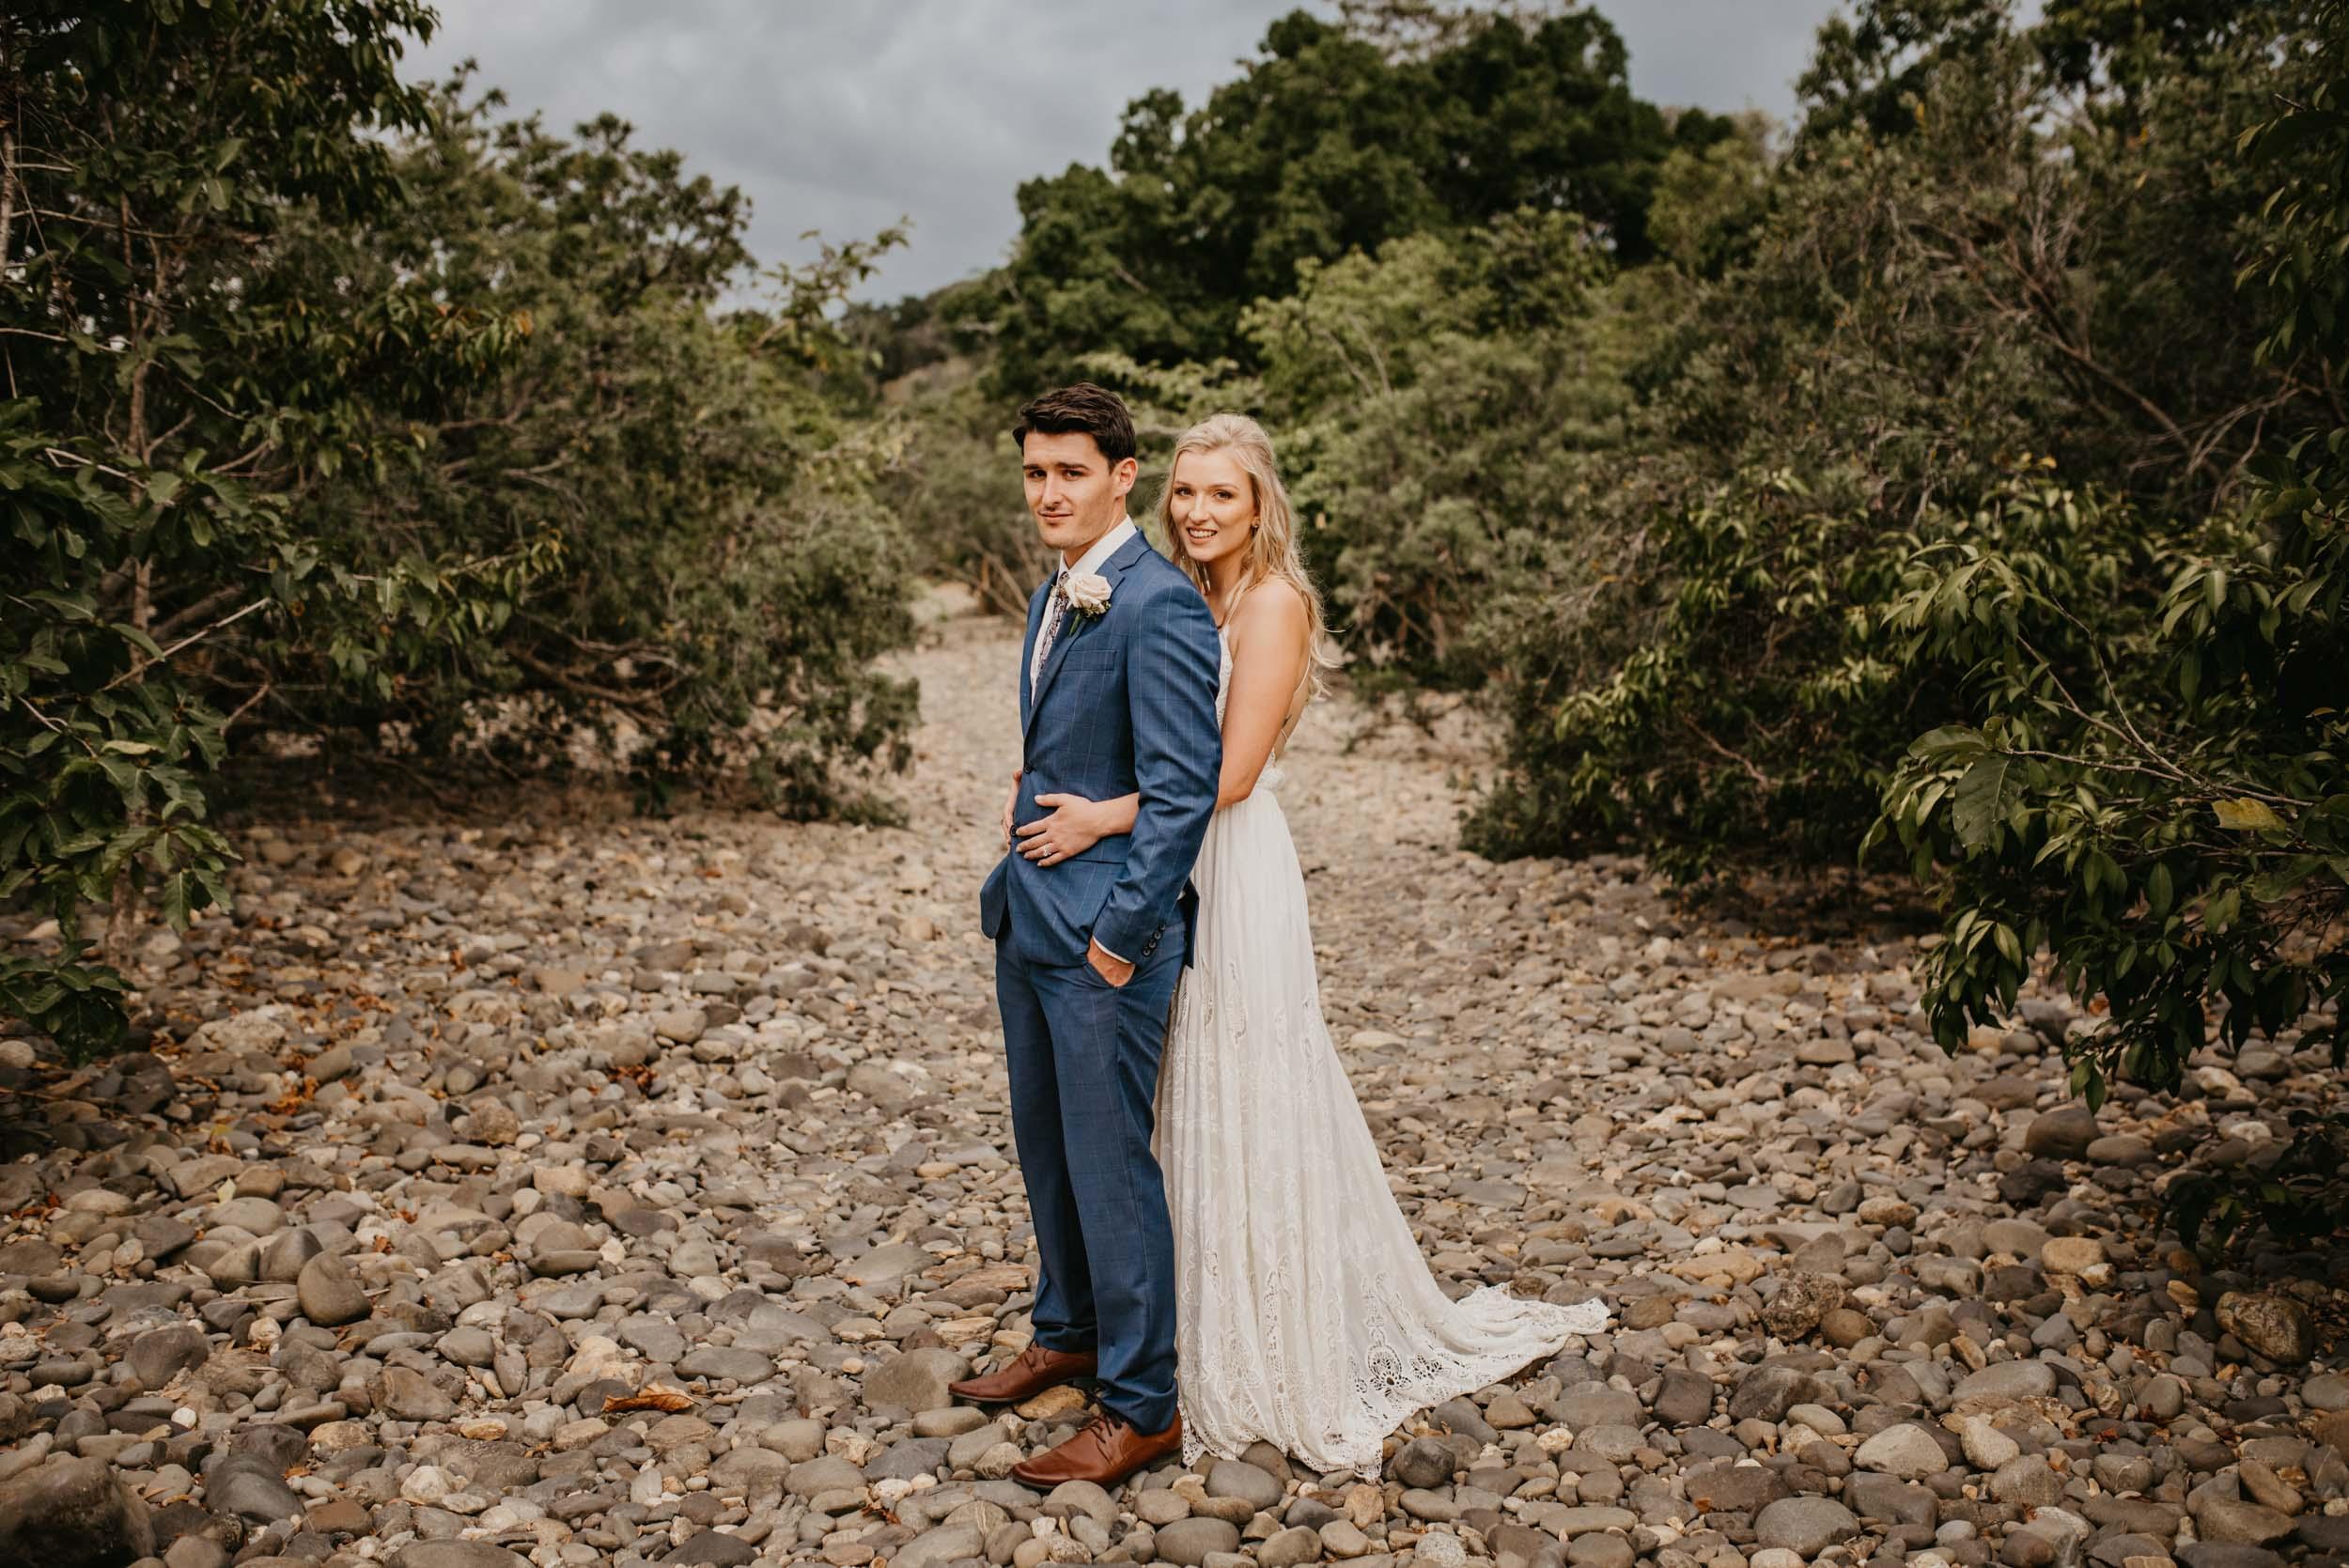 The Raw Photographer - Cairns Wedding Photographer - Laloli - Cairns Garden Wedding - Wedding Dress-60.jpg